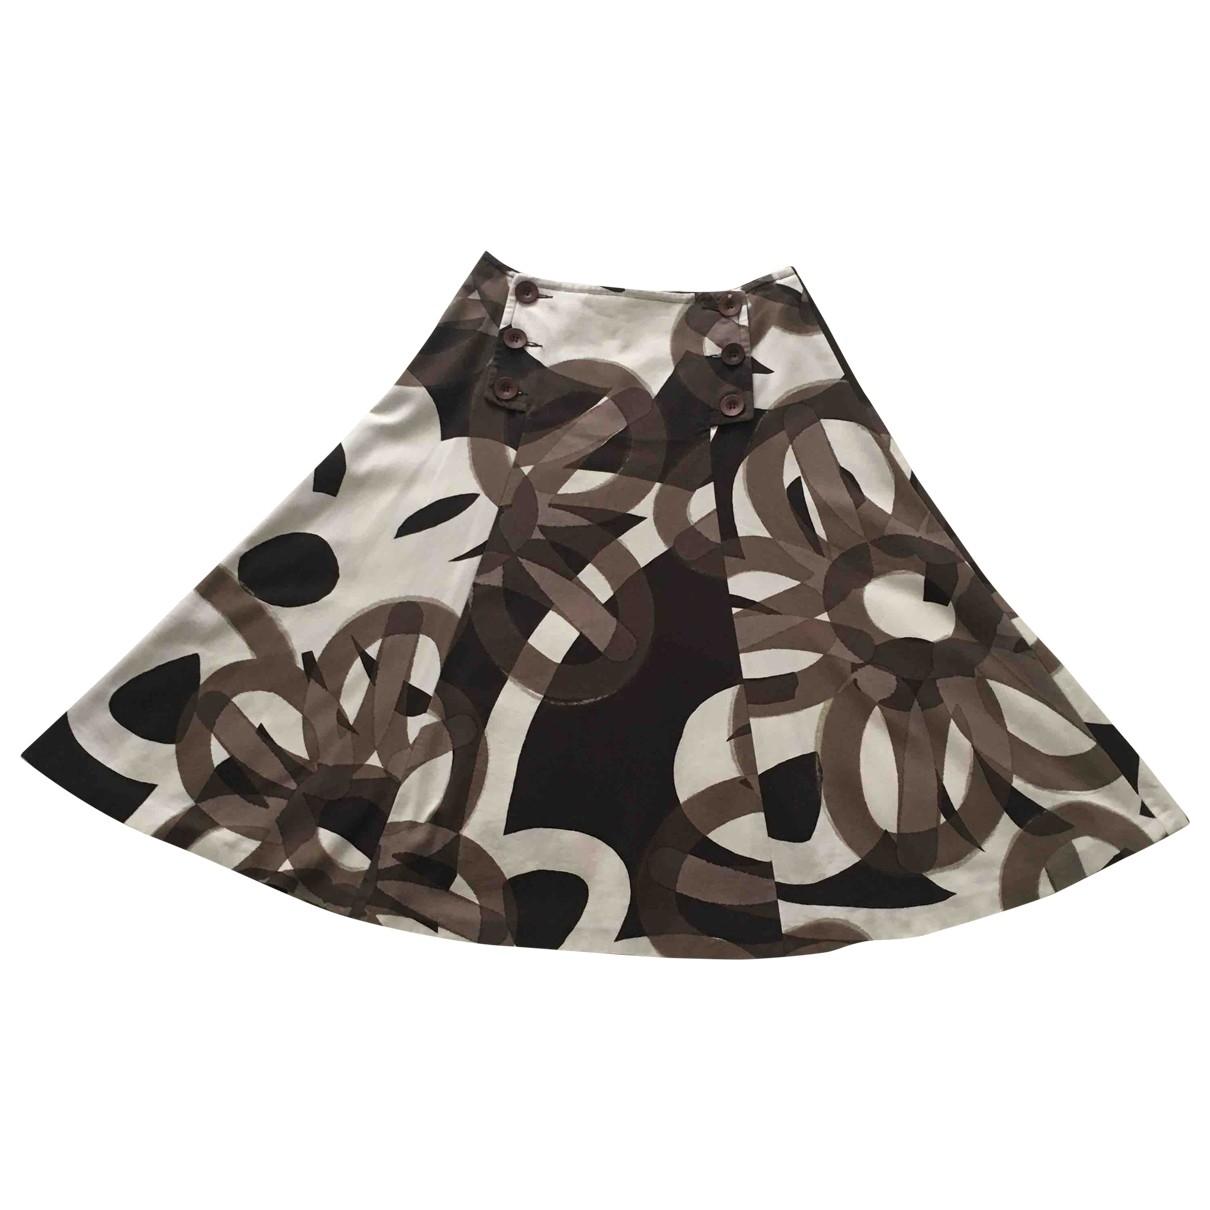 Max Mara \N Brown Cotton skirt for Women 40 IT